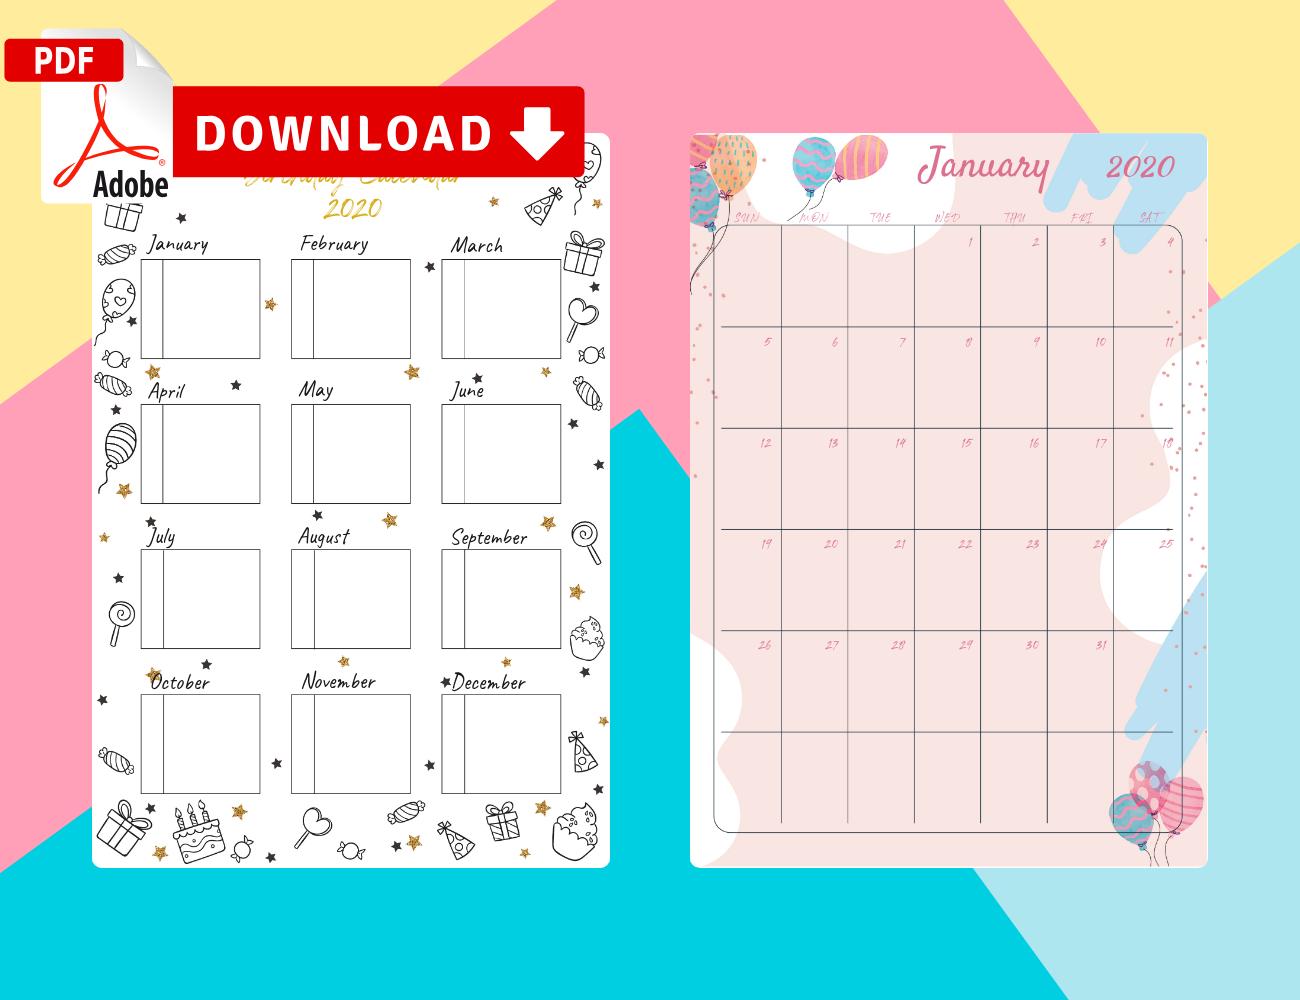 Birthday Calendar - Download Printable Birthday Calendar Free Fill In Birthday Calendar